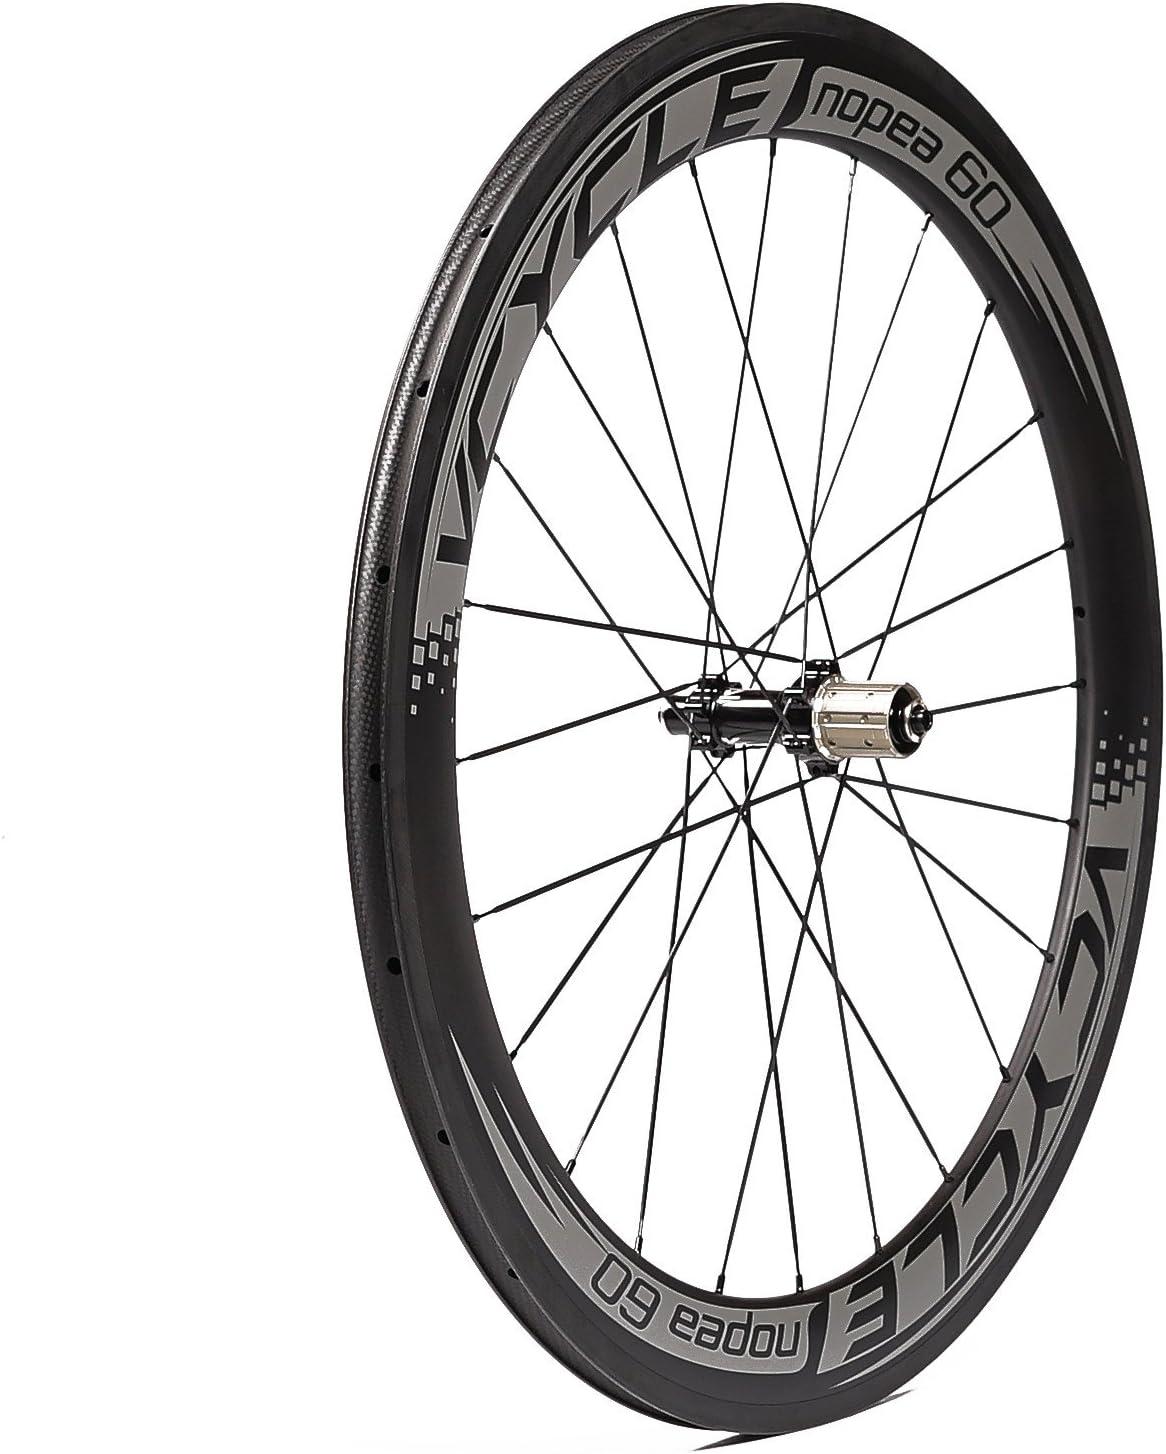 VCYCLE Nopea 700C Carbono Carretera Bicicleta Ruedas 60mm Cubierta ...